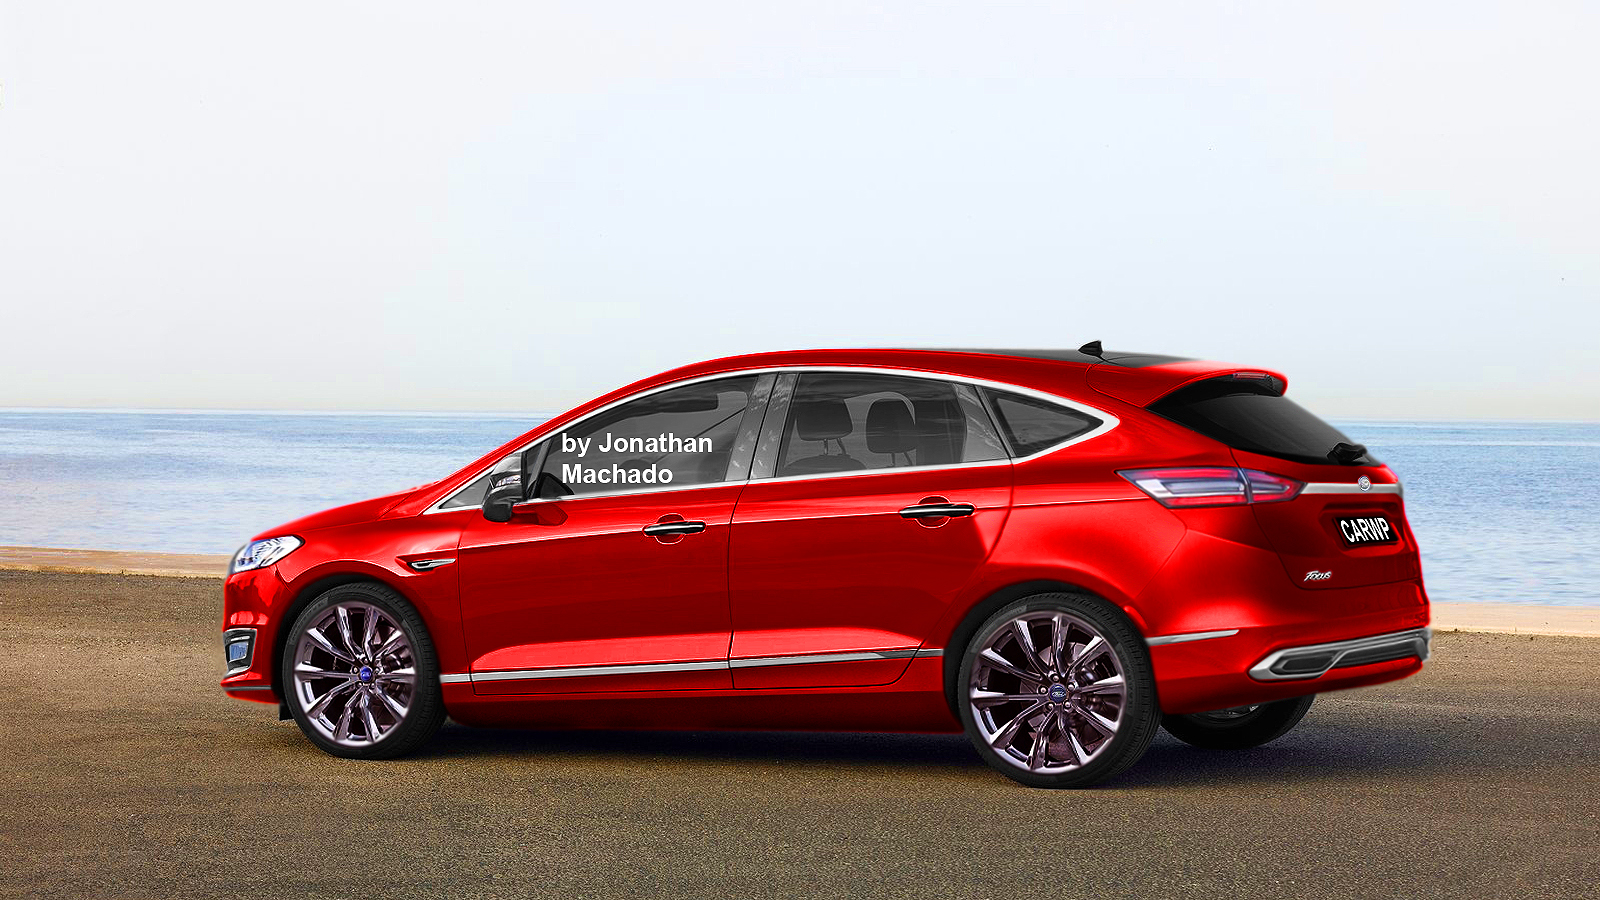 Ford | Новые автомобили 2017-2018, авто новинки на PovozCar.ru